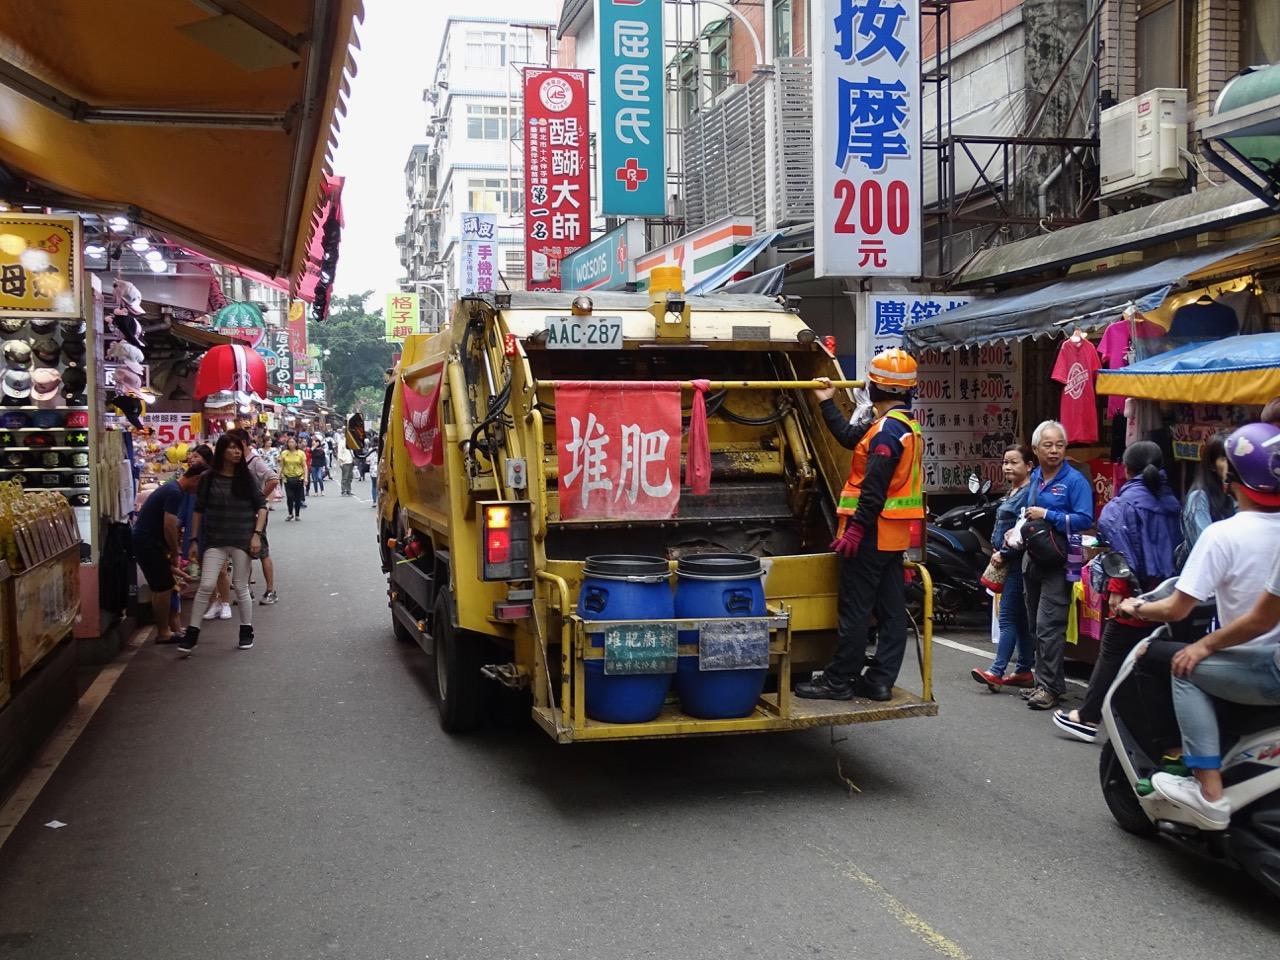 Musical garbage truck